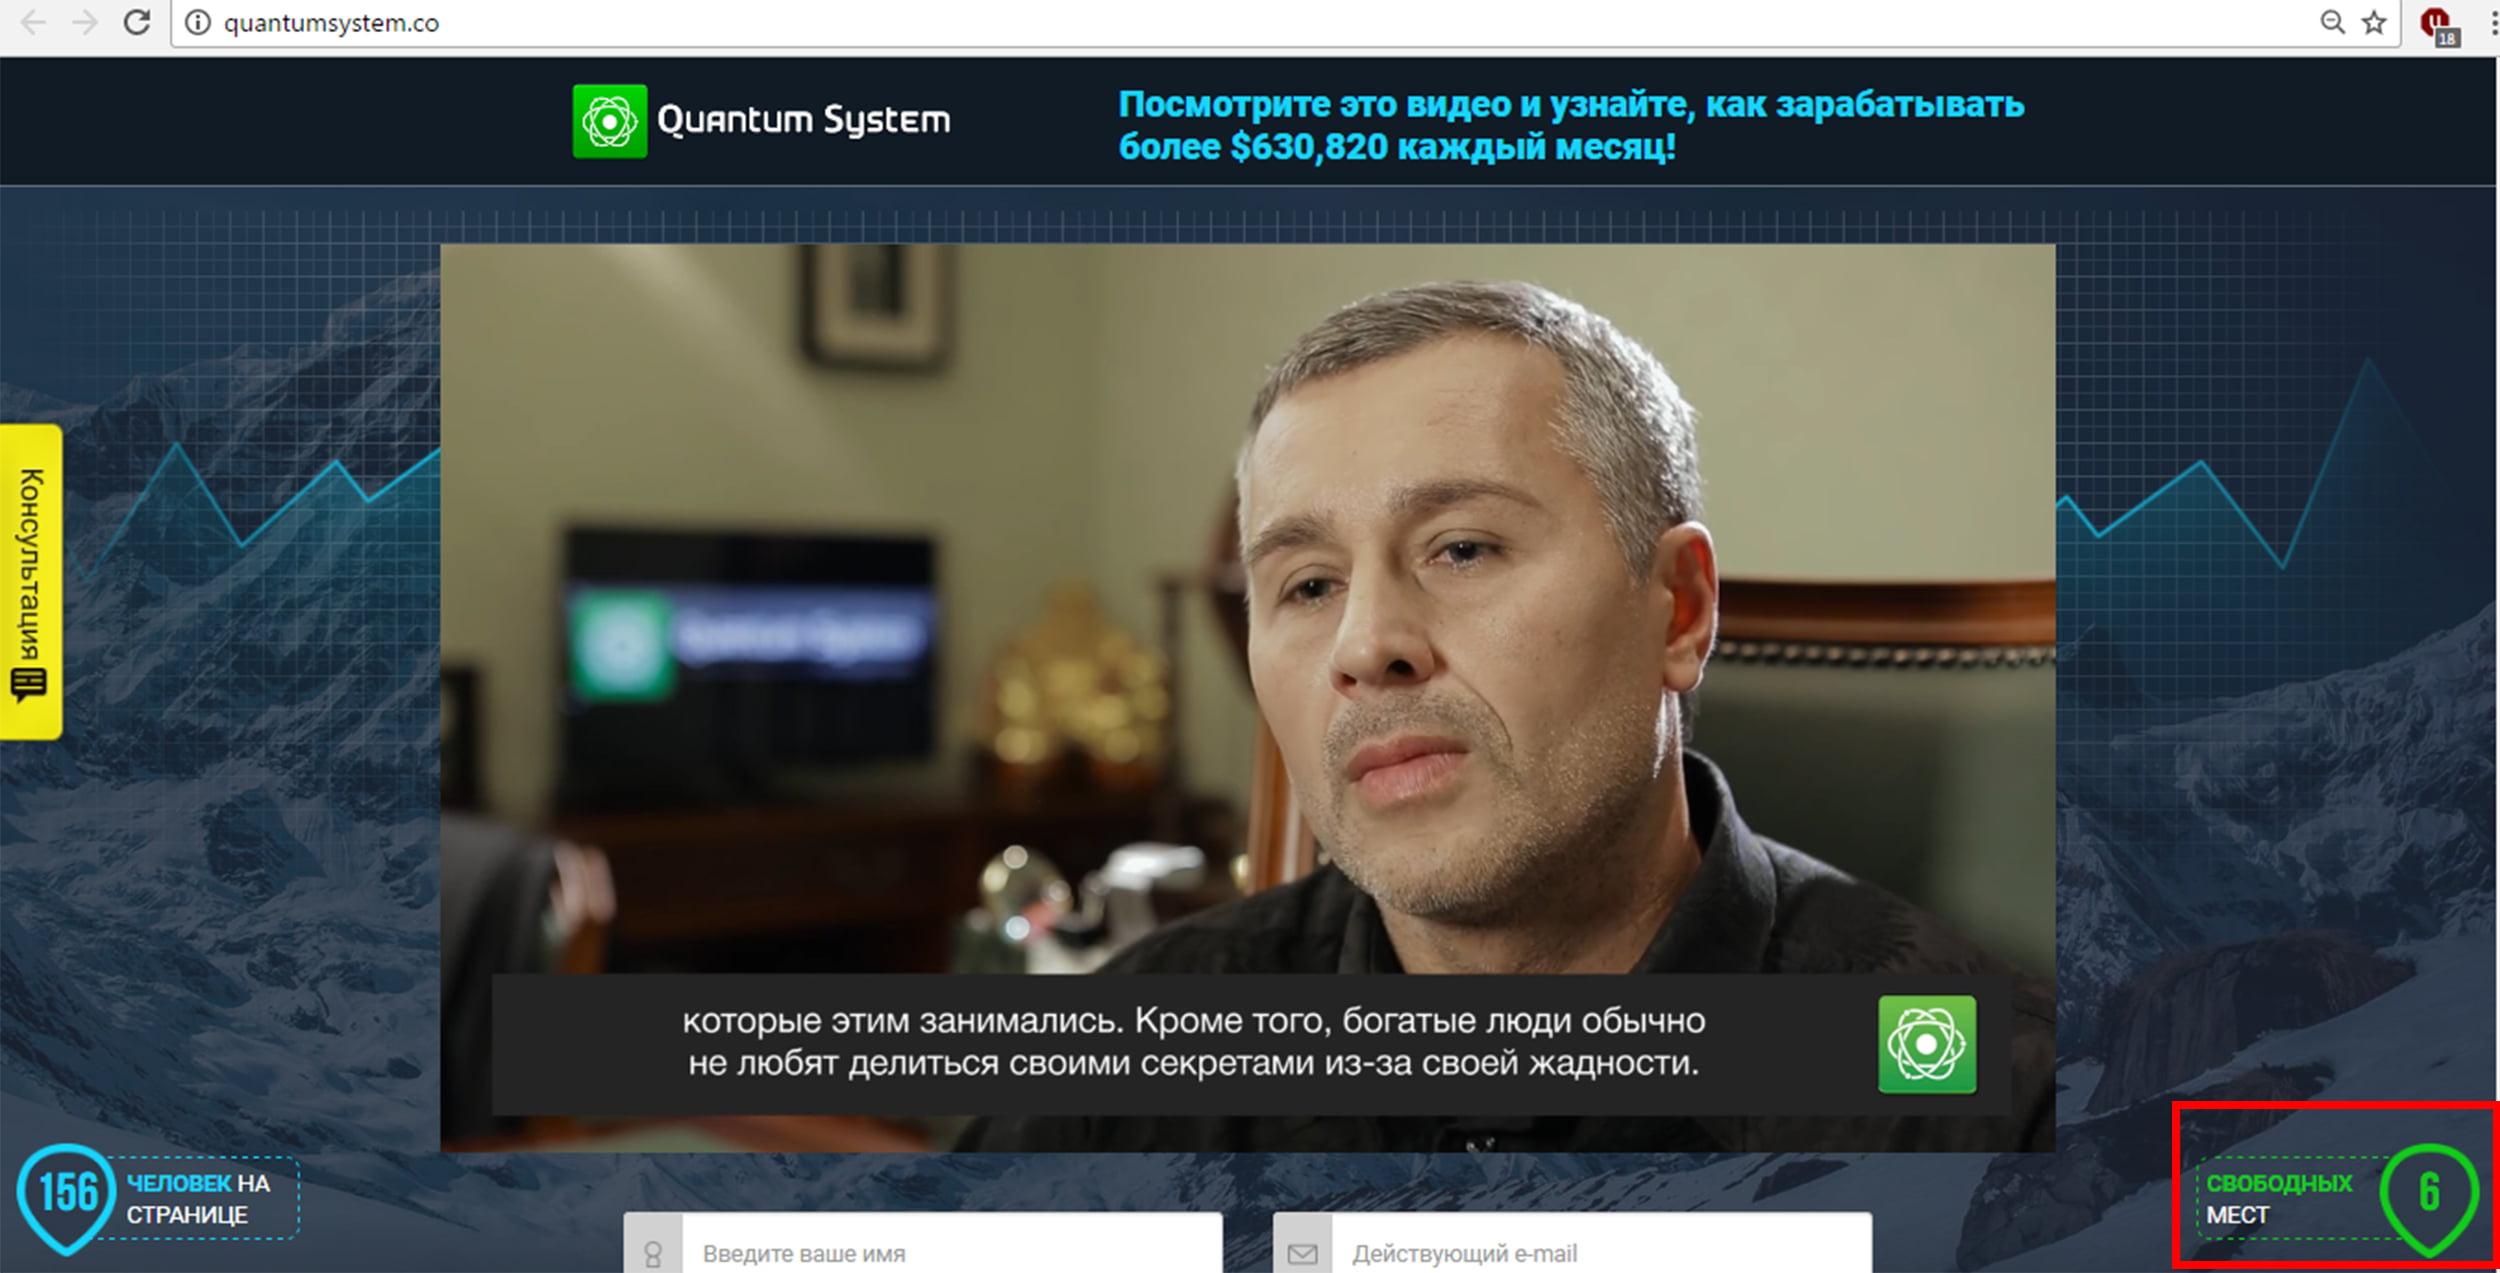 Презентация Quantum System